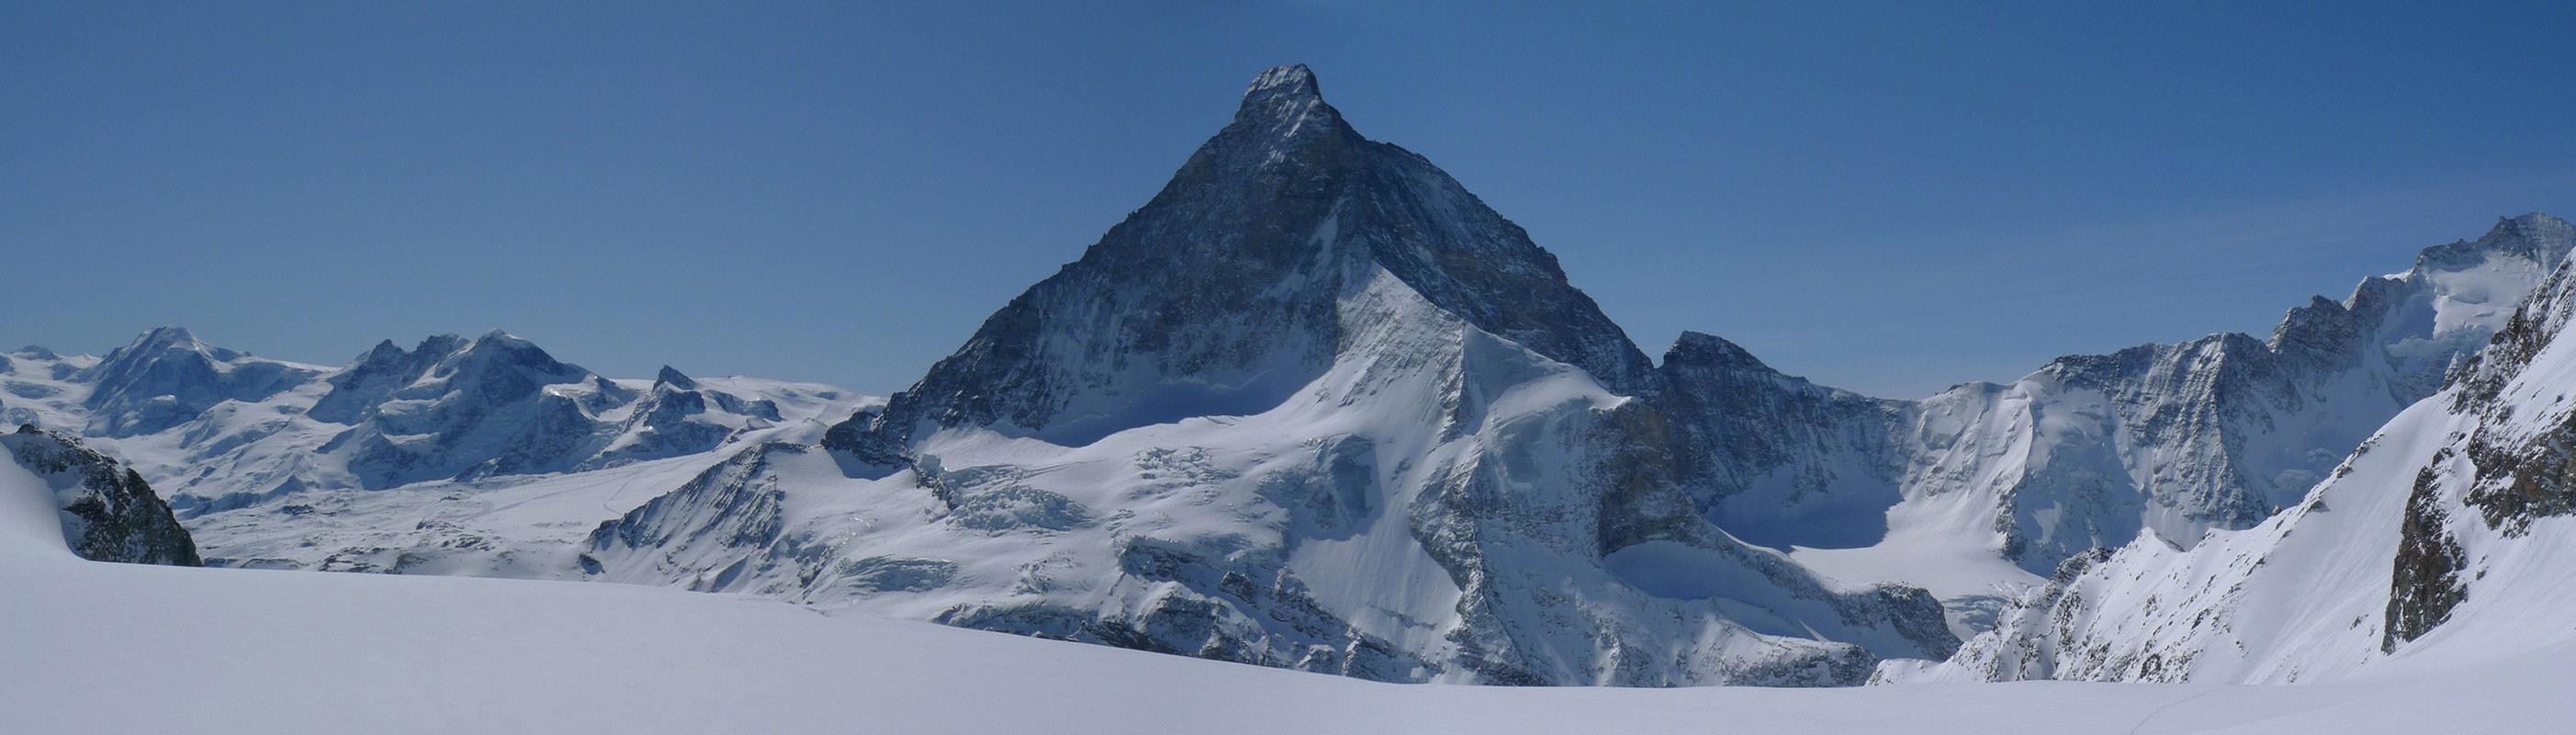 Mont Durand / Arbenhorn Walliser Alpen / Alpes valaisannes Switzerland panorama 37